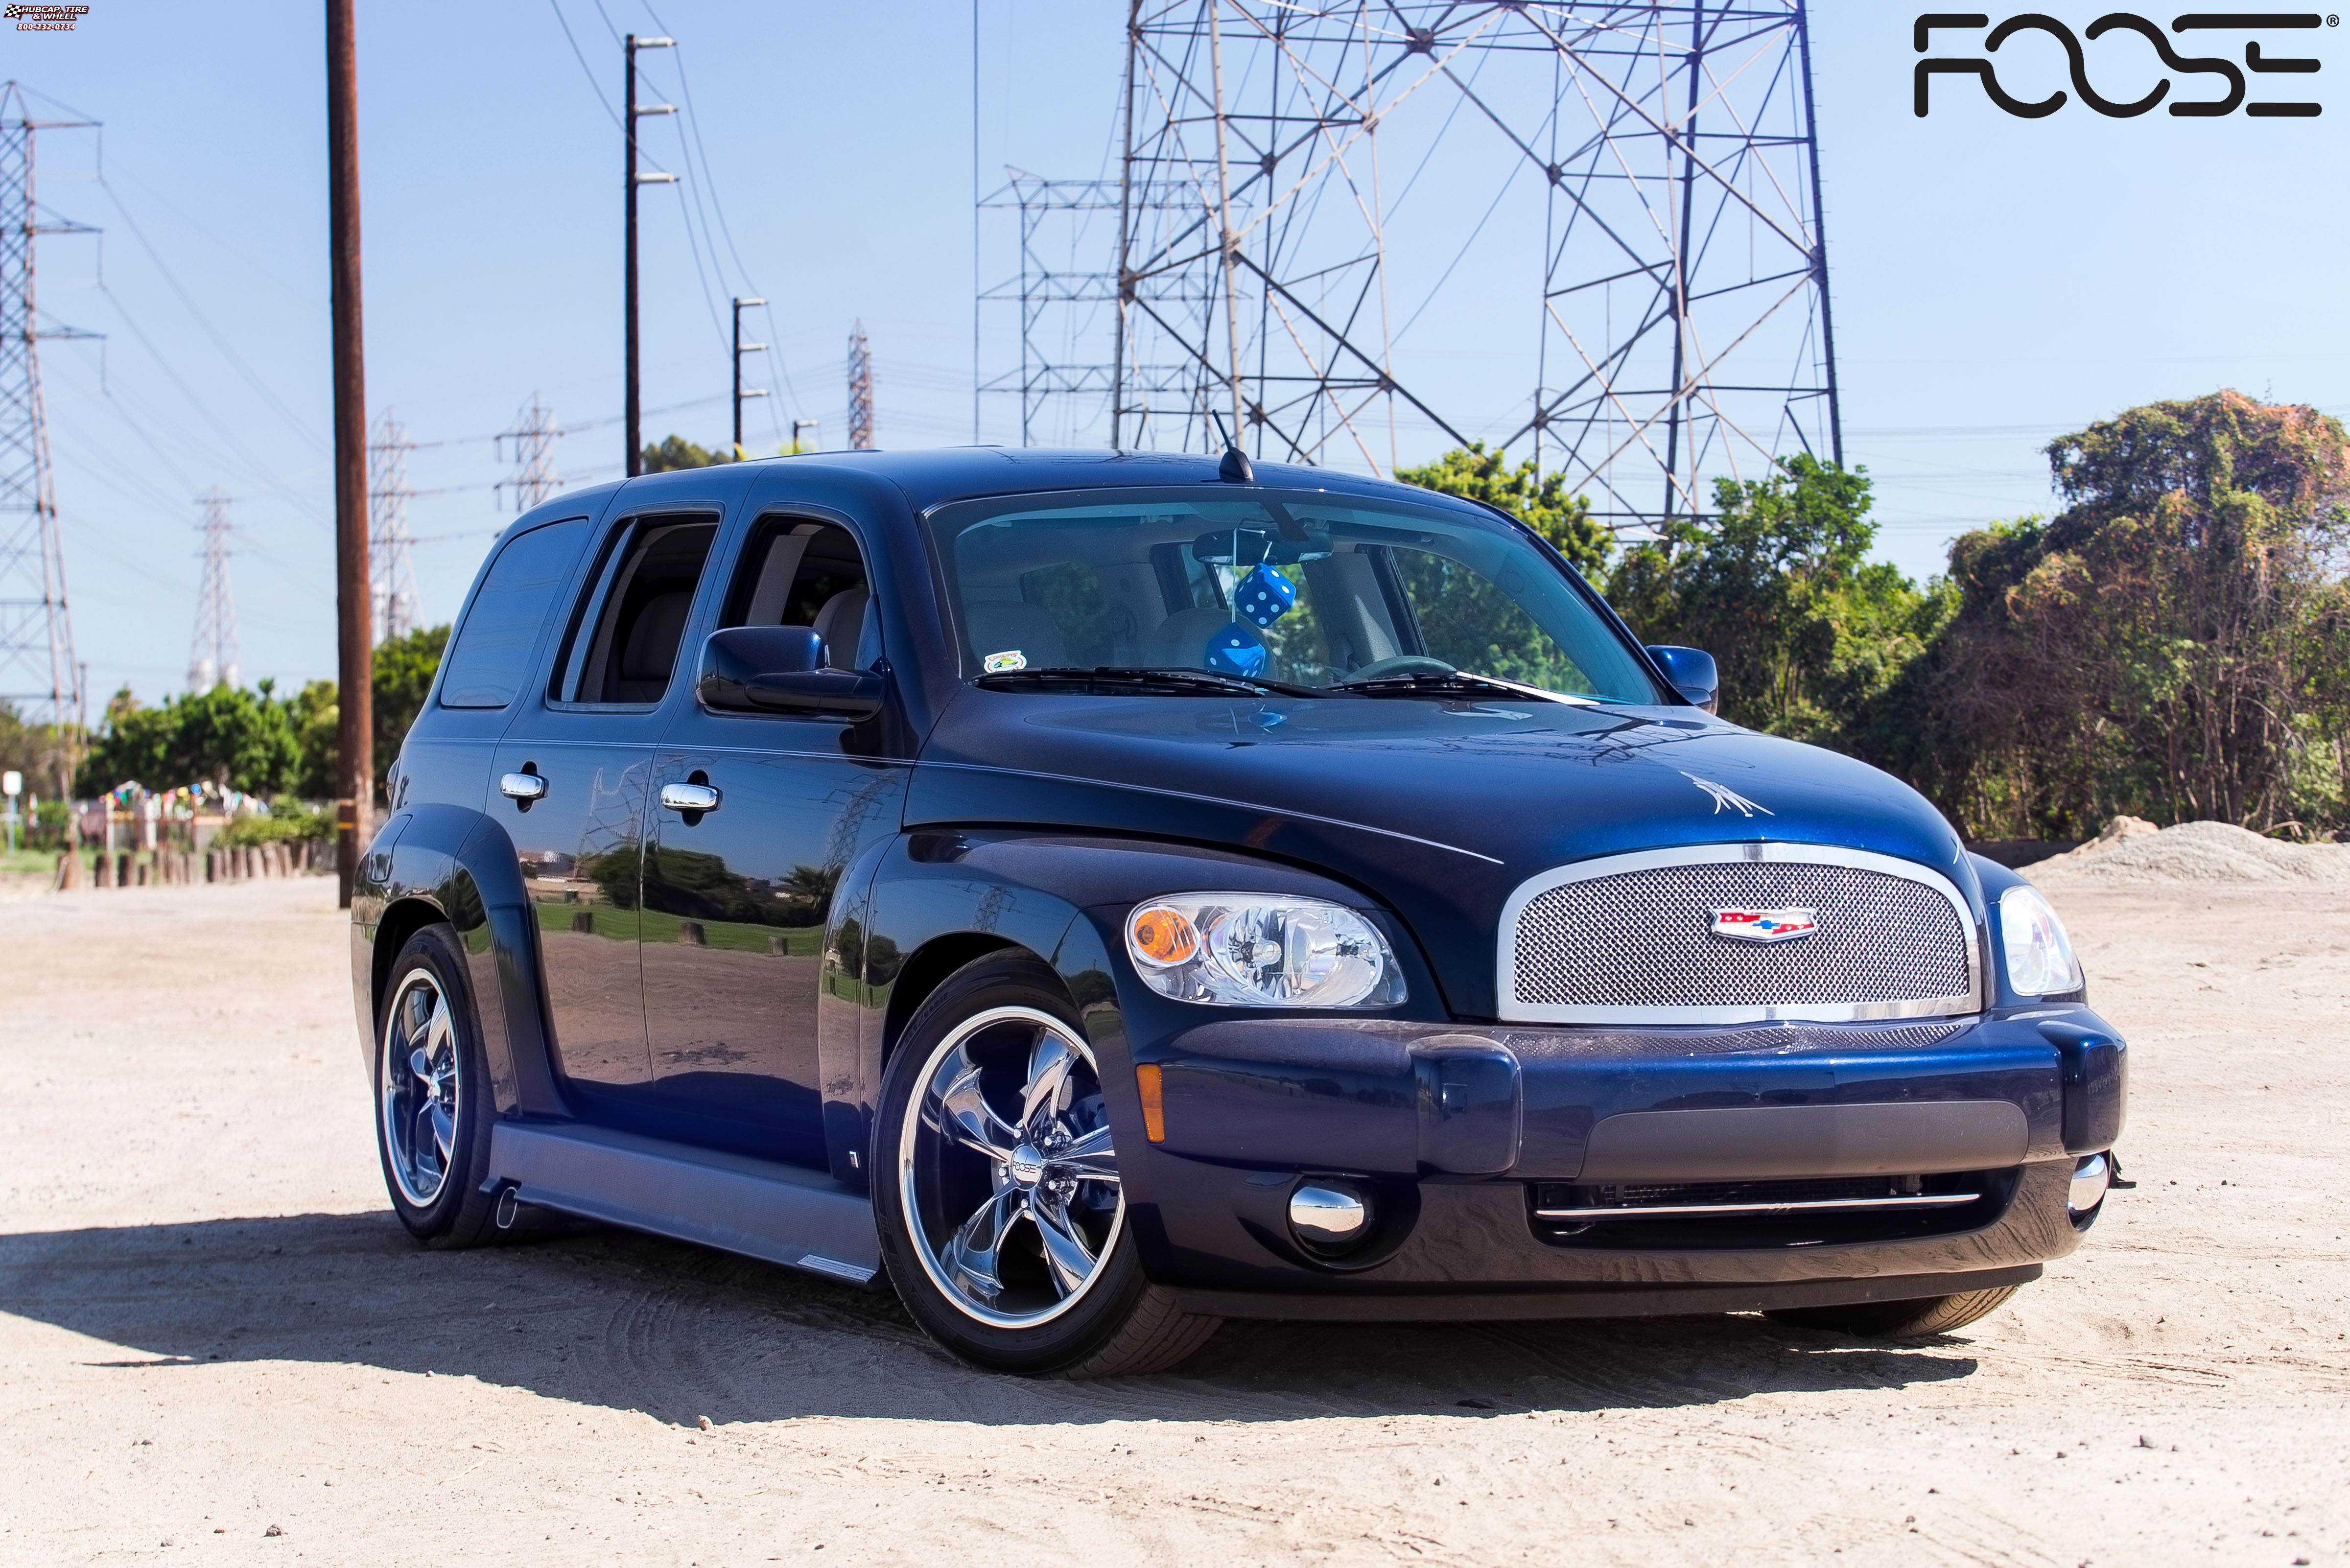 2007 Chevrolet HHR Foose Legend F103 Wheels PVD